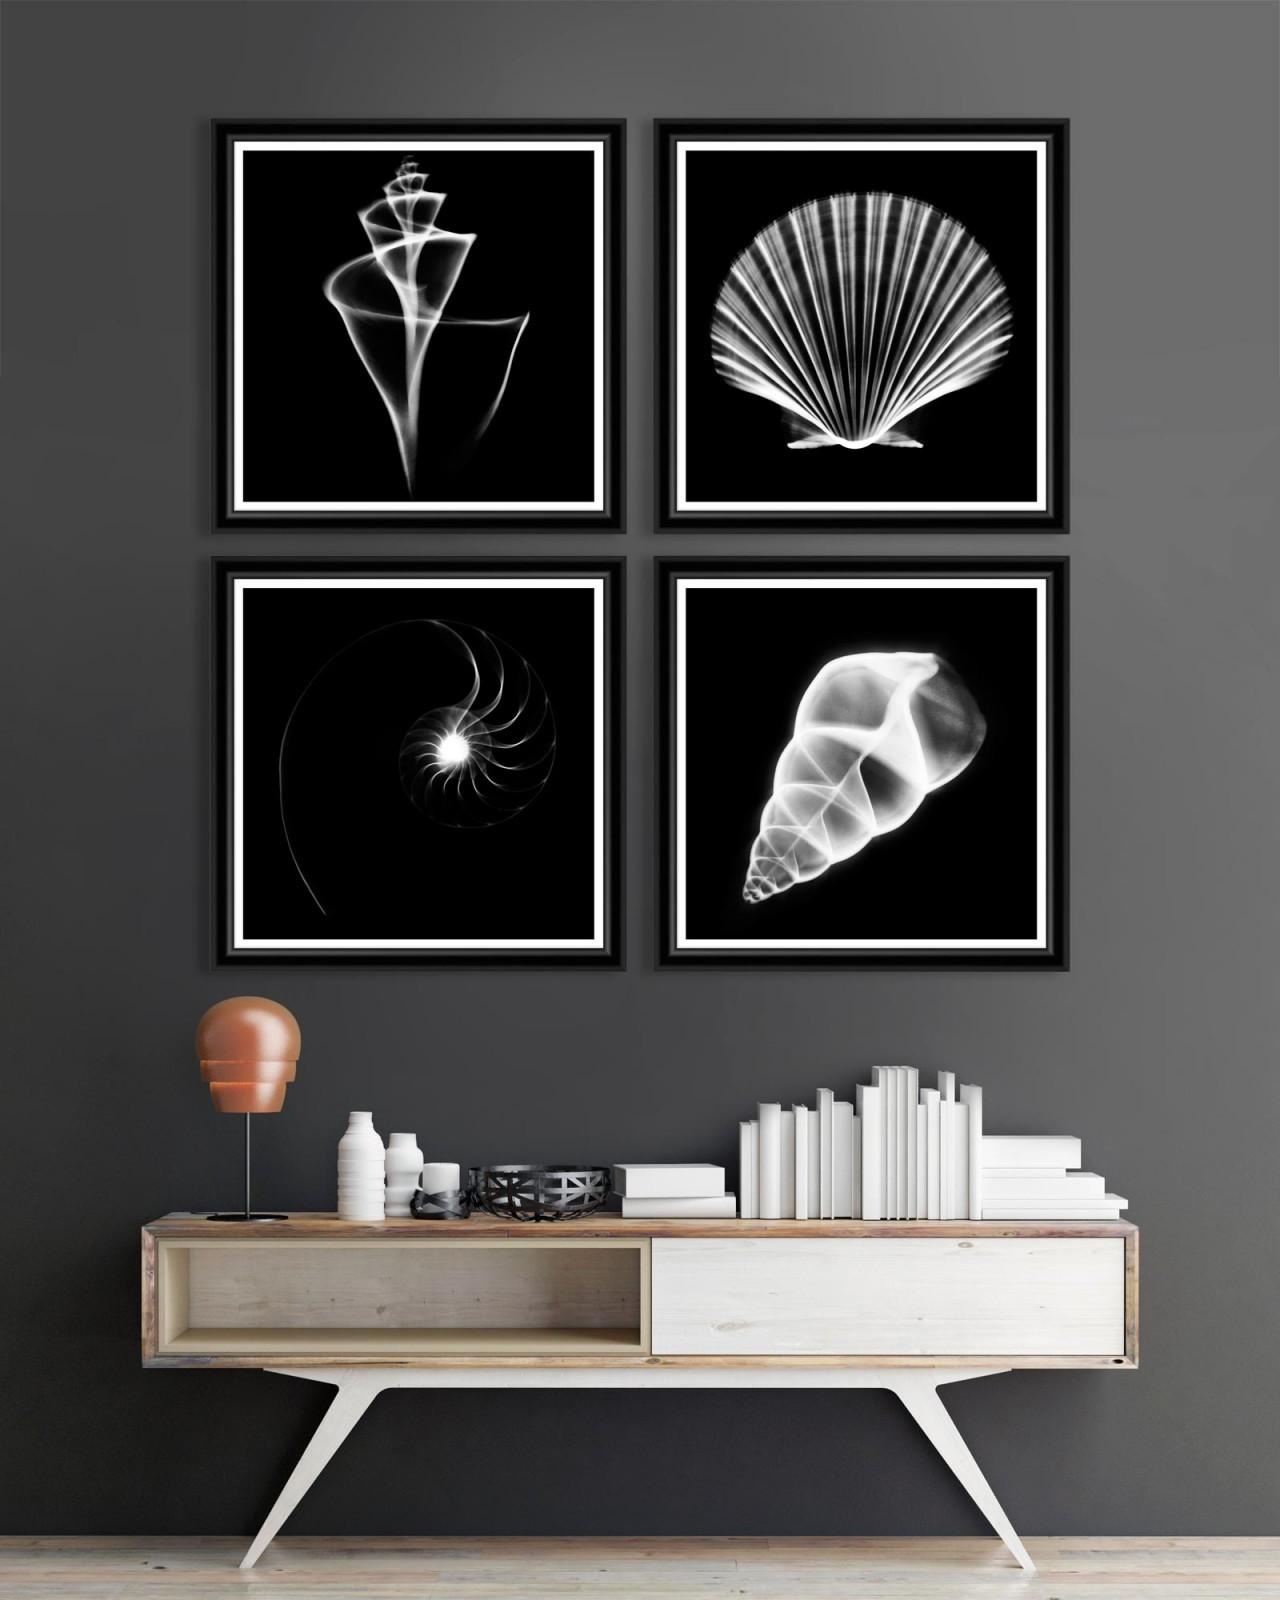 TRANSLUCENT SEA SPECIES Set of 4 Framed art